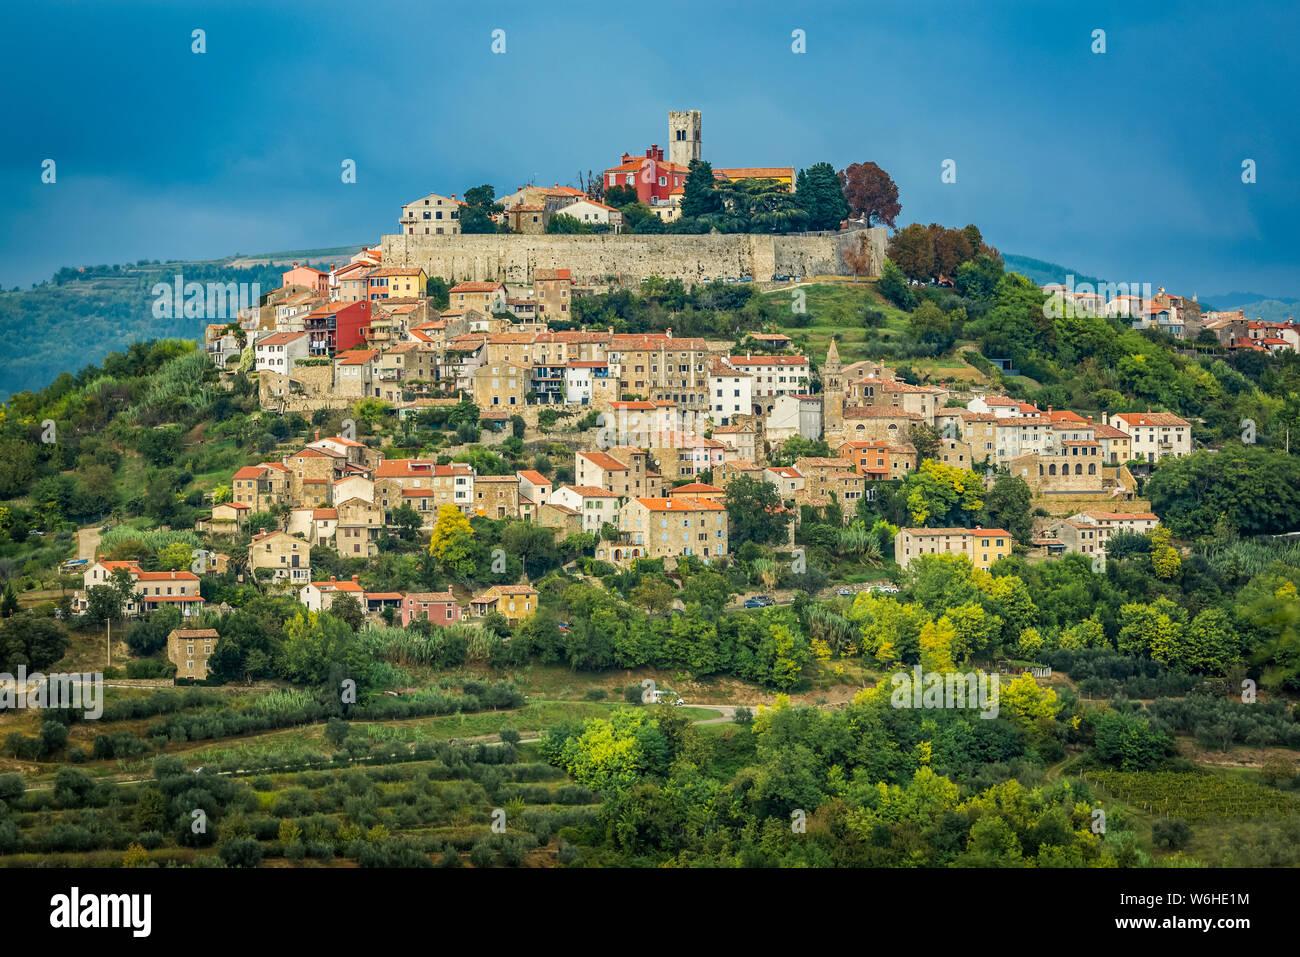 Vineyards surrounding the hilltop medieval town of Motovun; Motovun, Istria, Croatia Stock Photo